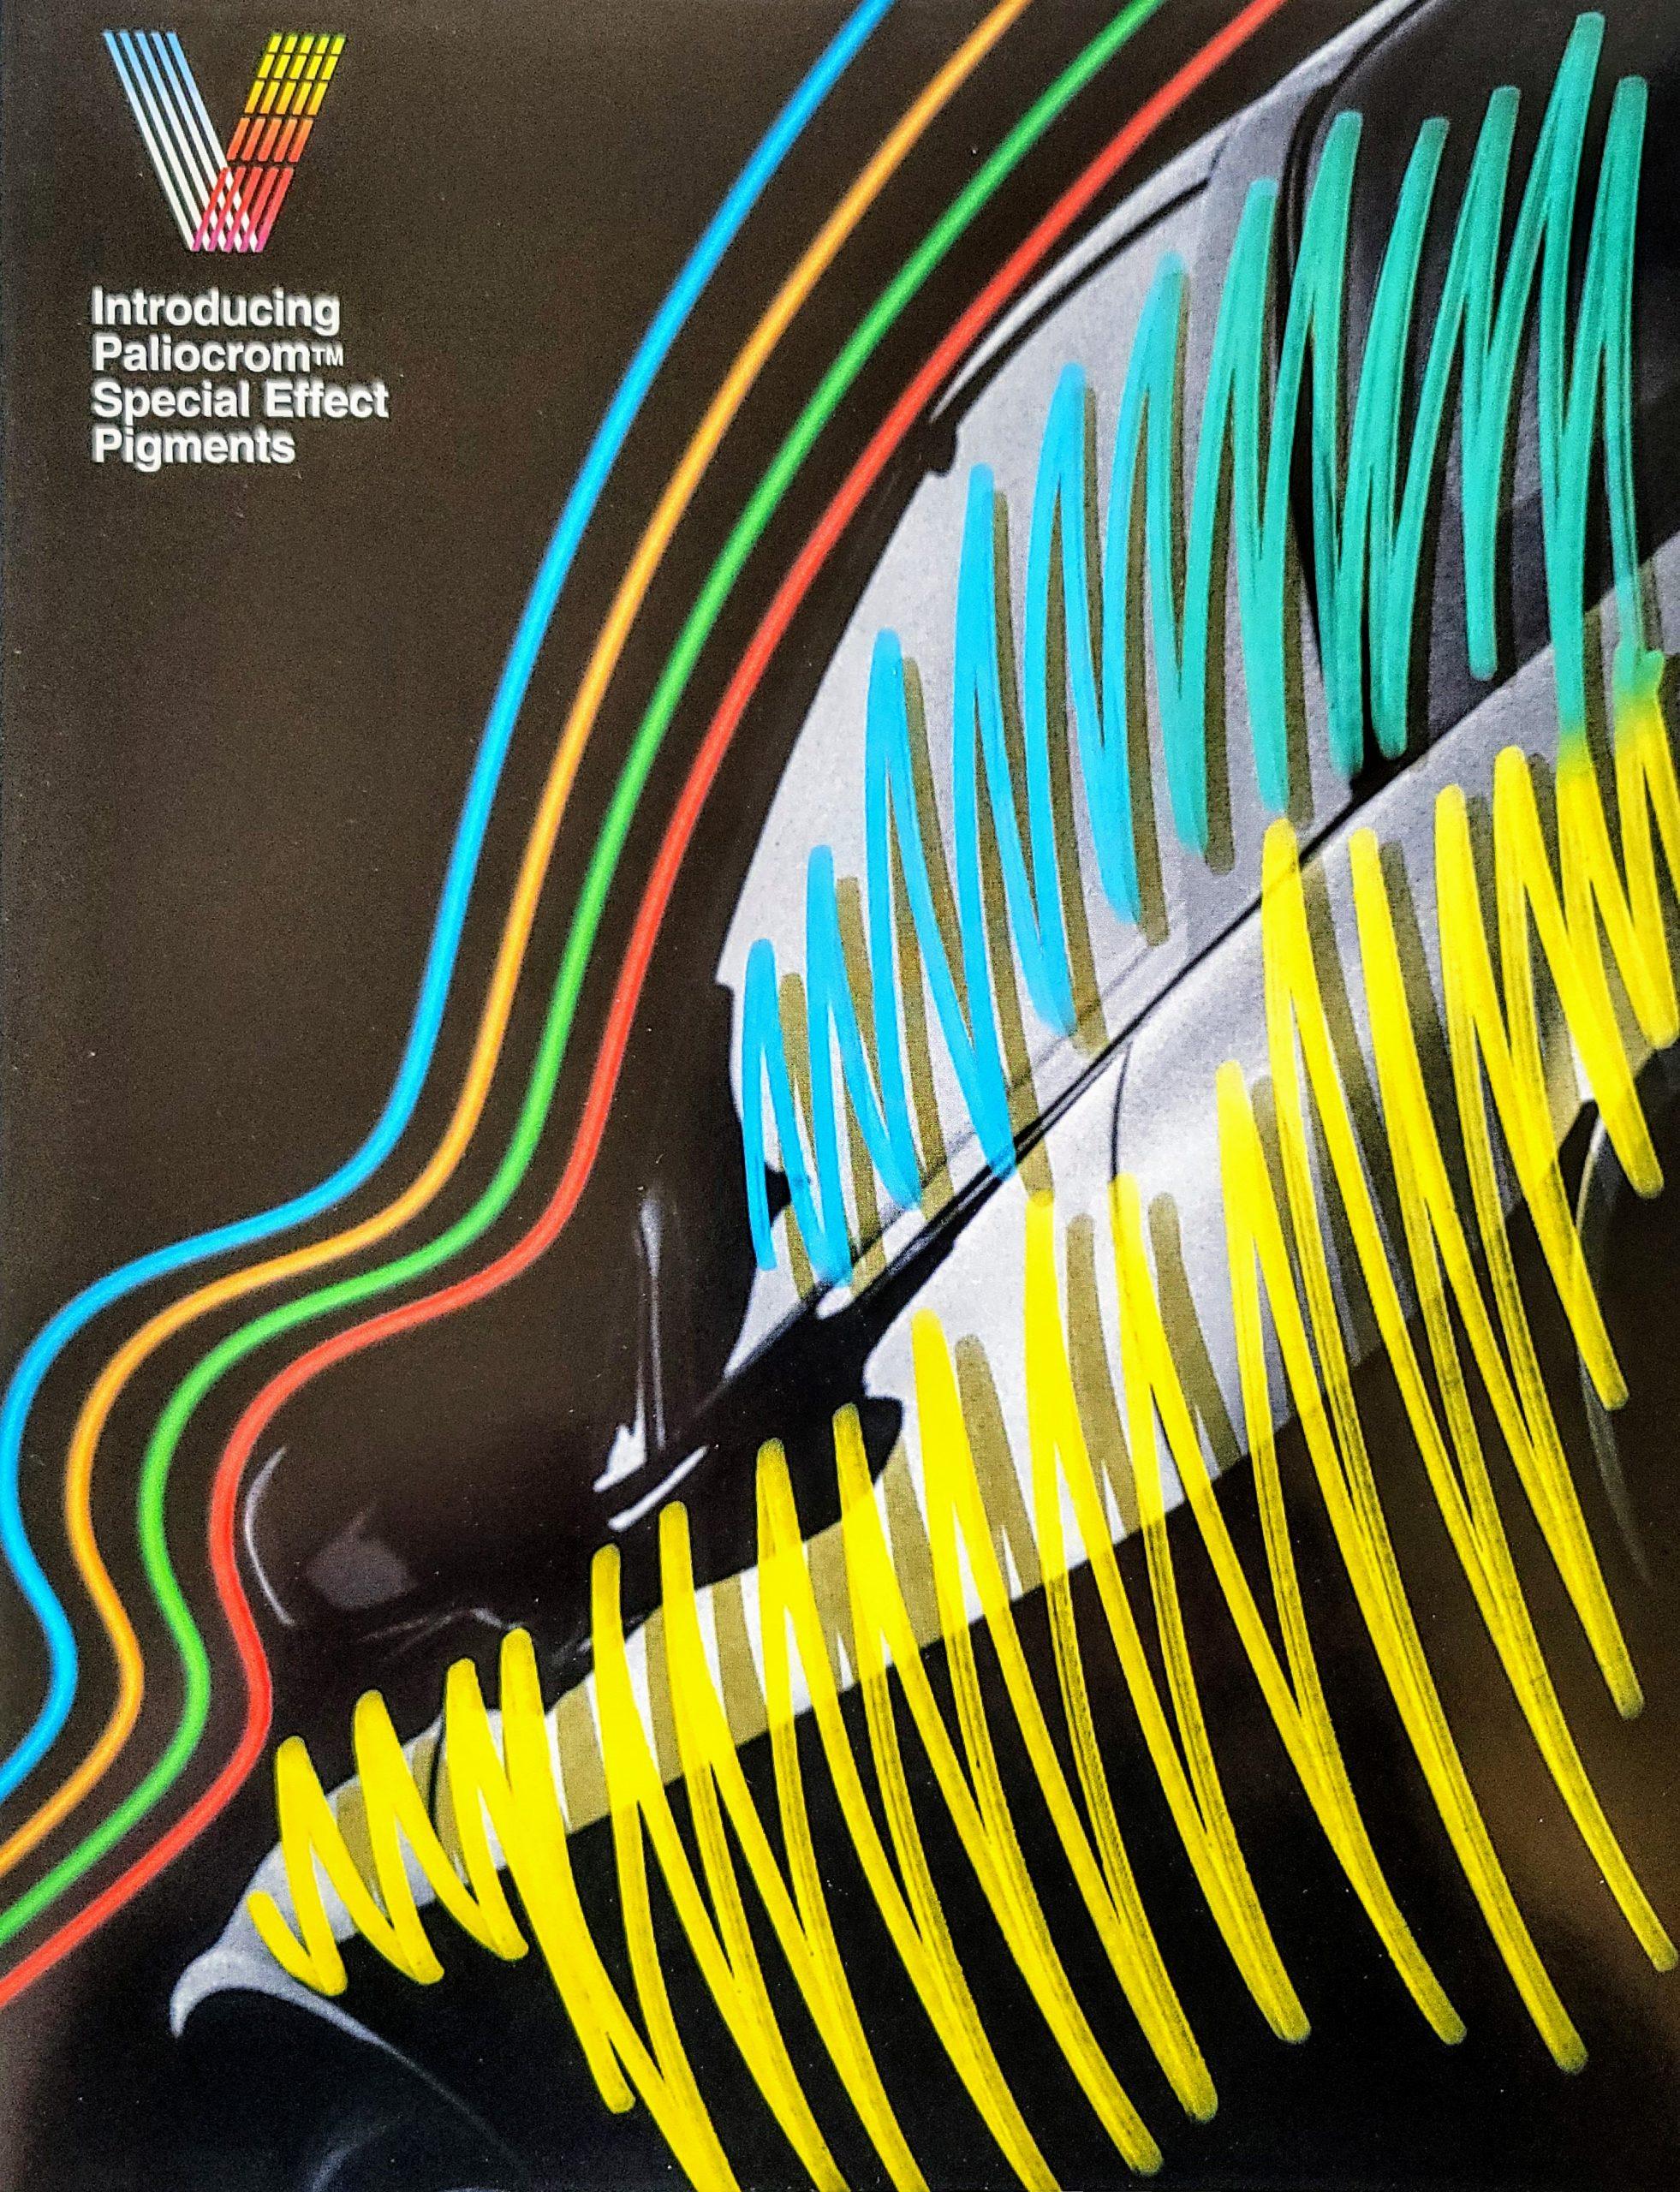 basf_paliochrome_brochure_12